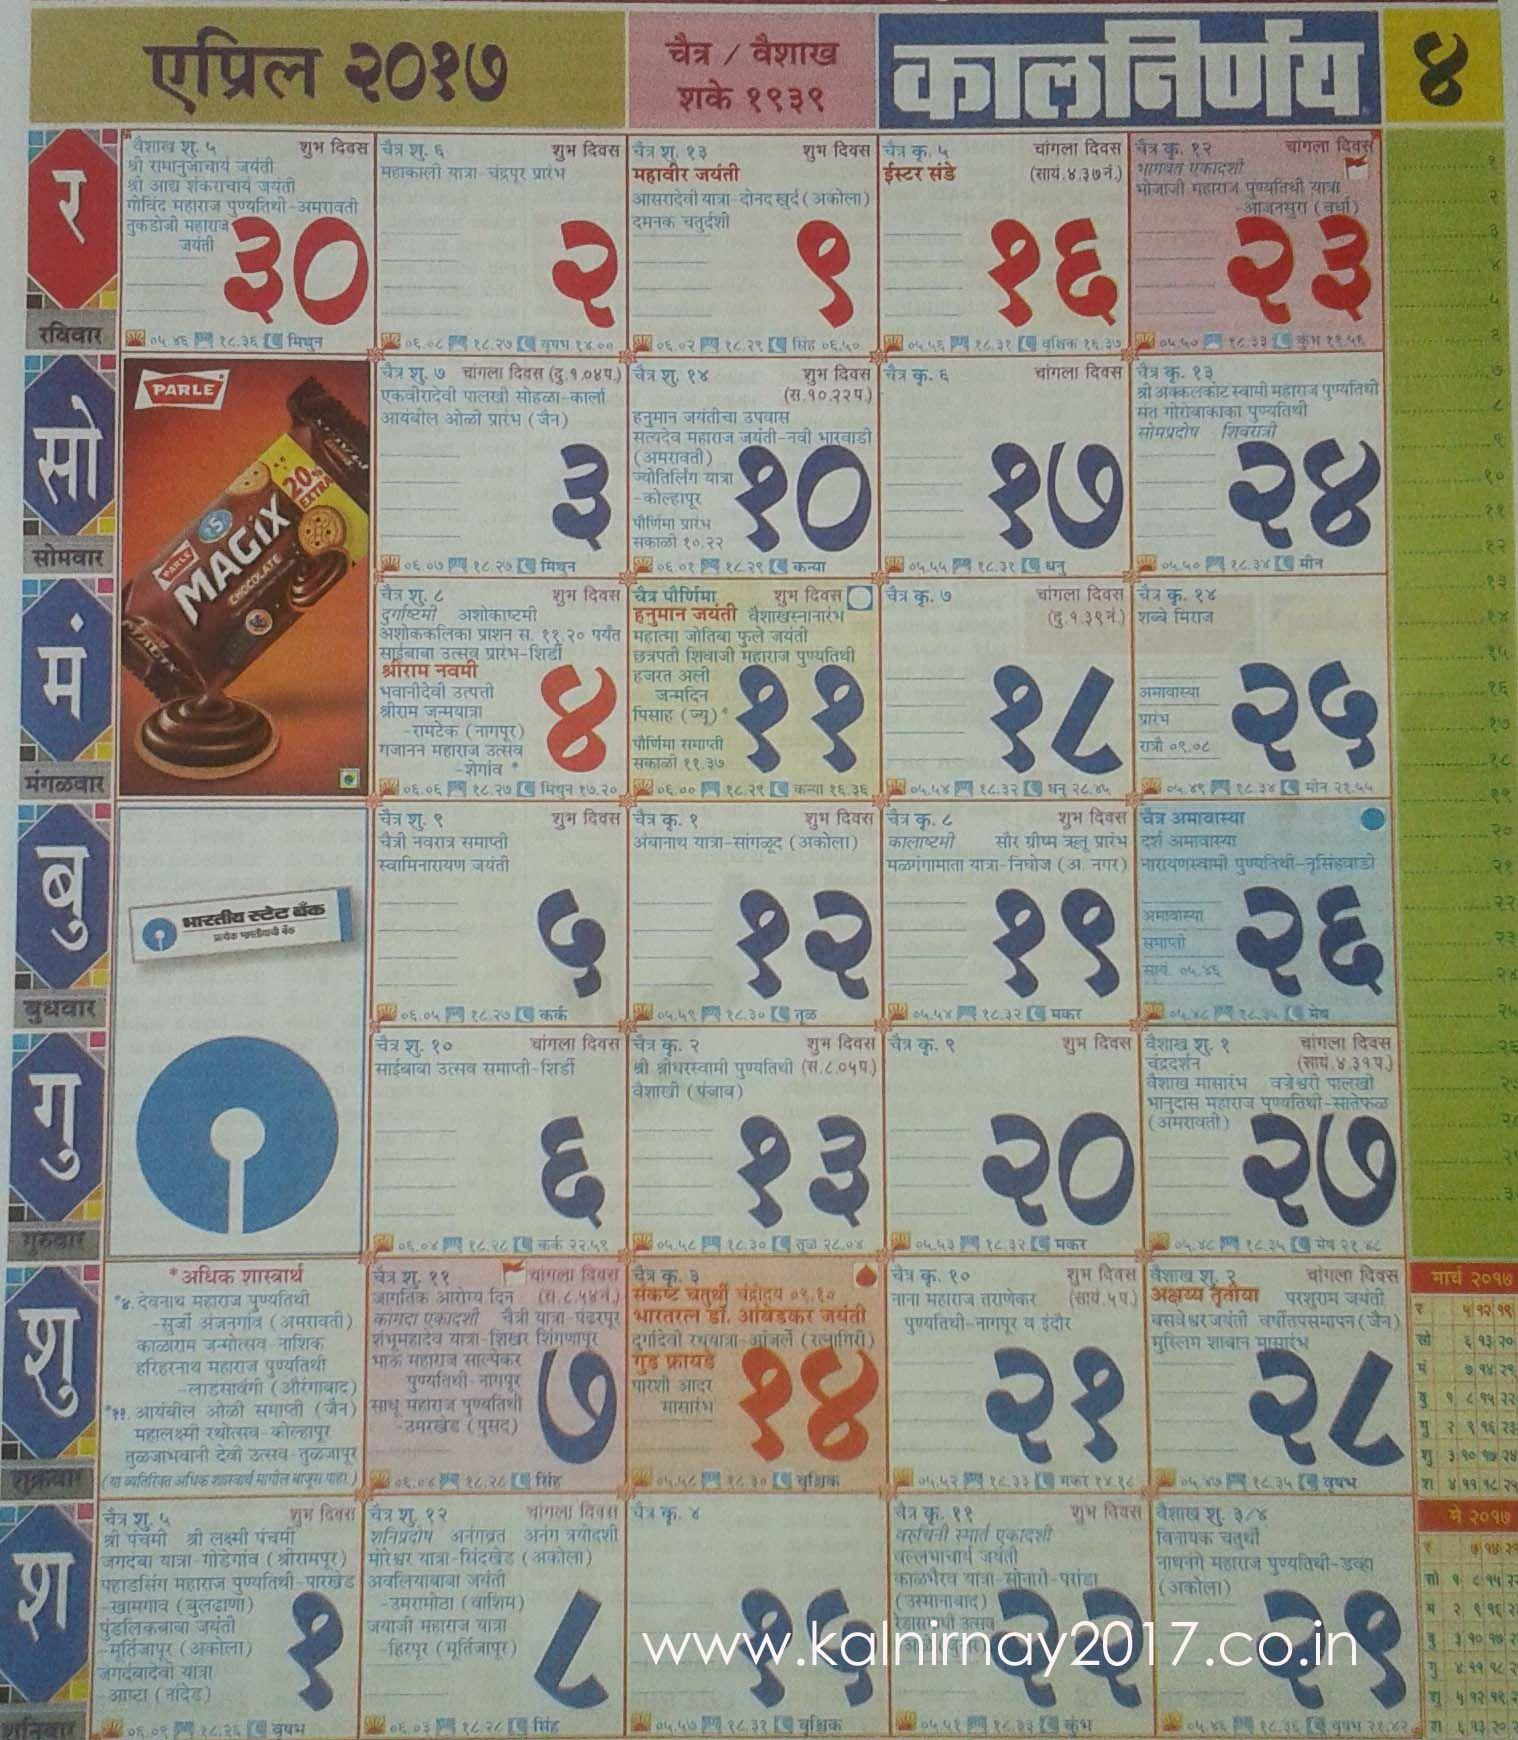 October 2017 Calendar Marathi | Printable Calendars 2017